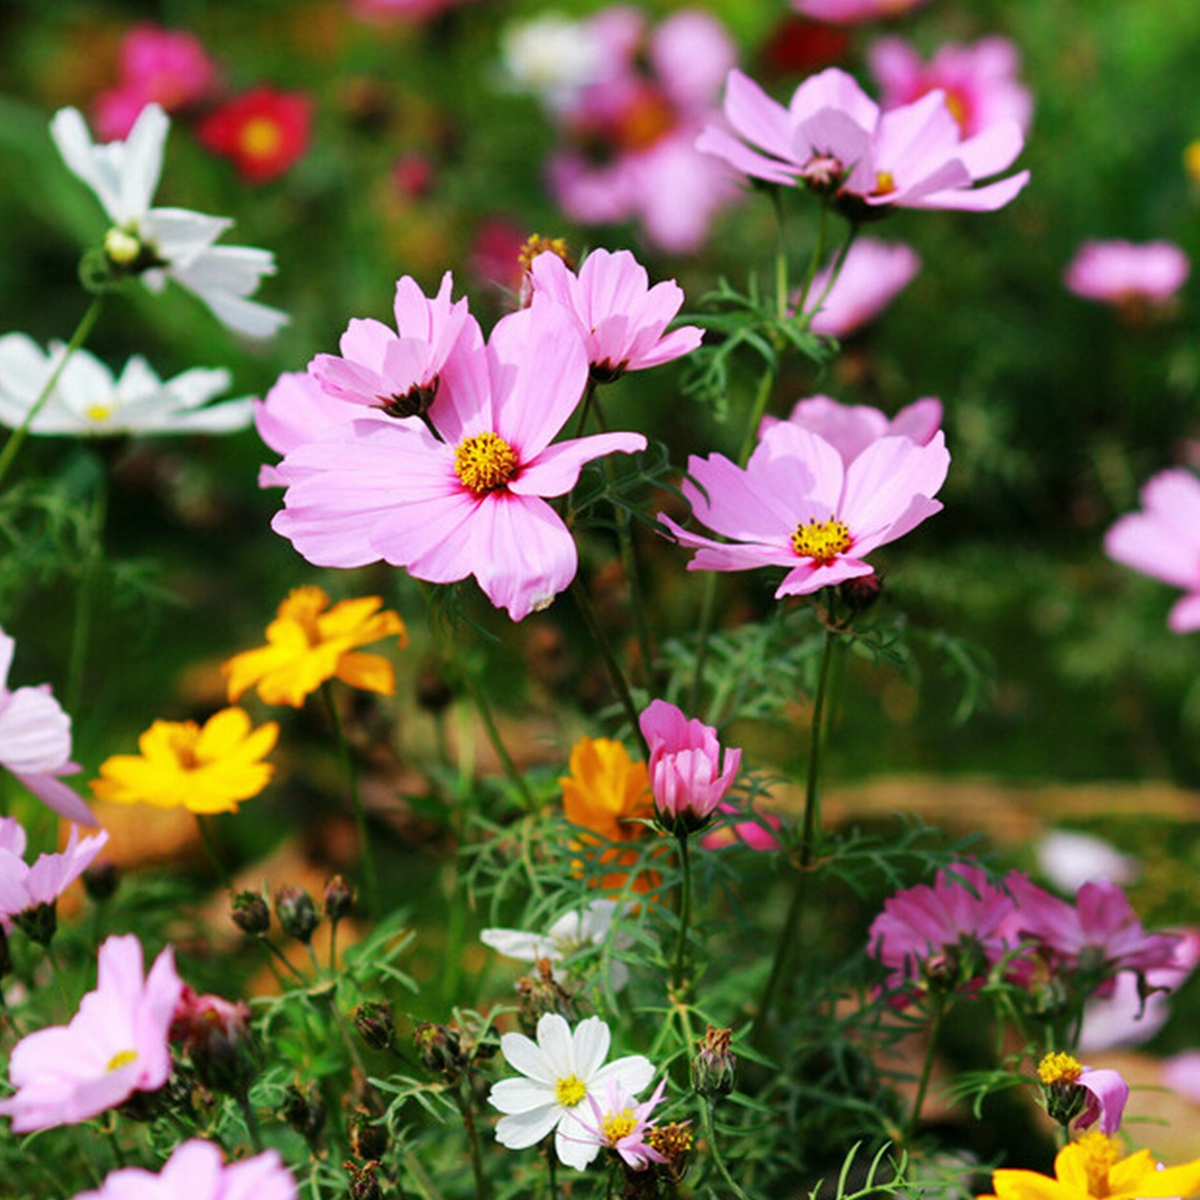 100 x cosmos bipinnatus perennial herbs garden park yard flower 100 x cosmos bipinnatus perennial herbs garden park mightylinksfo